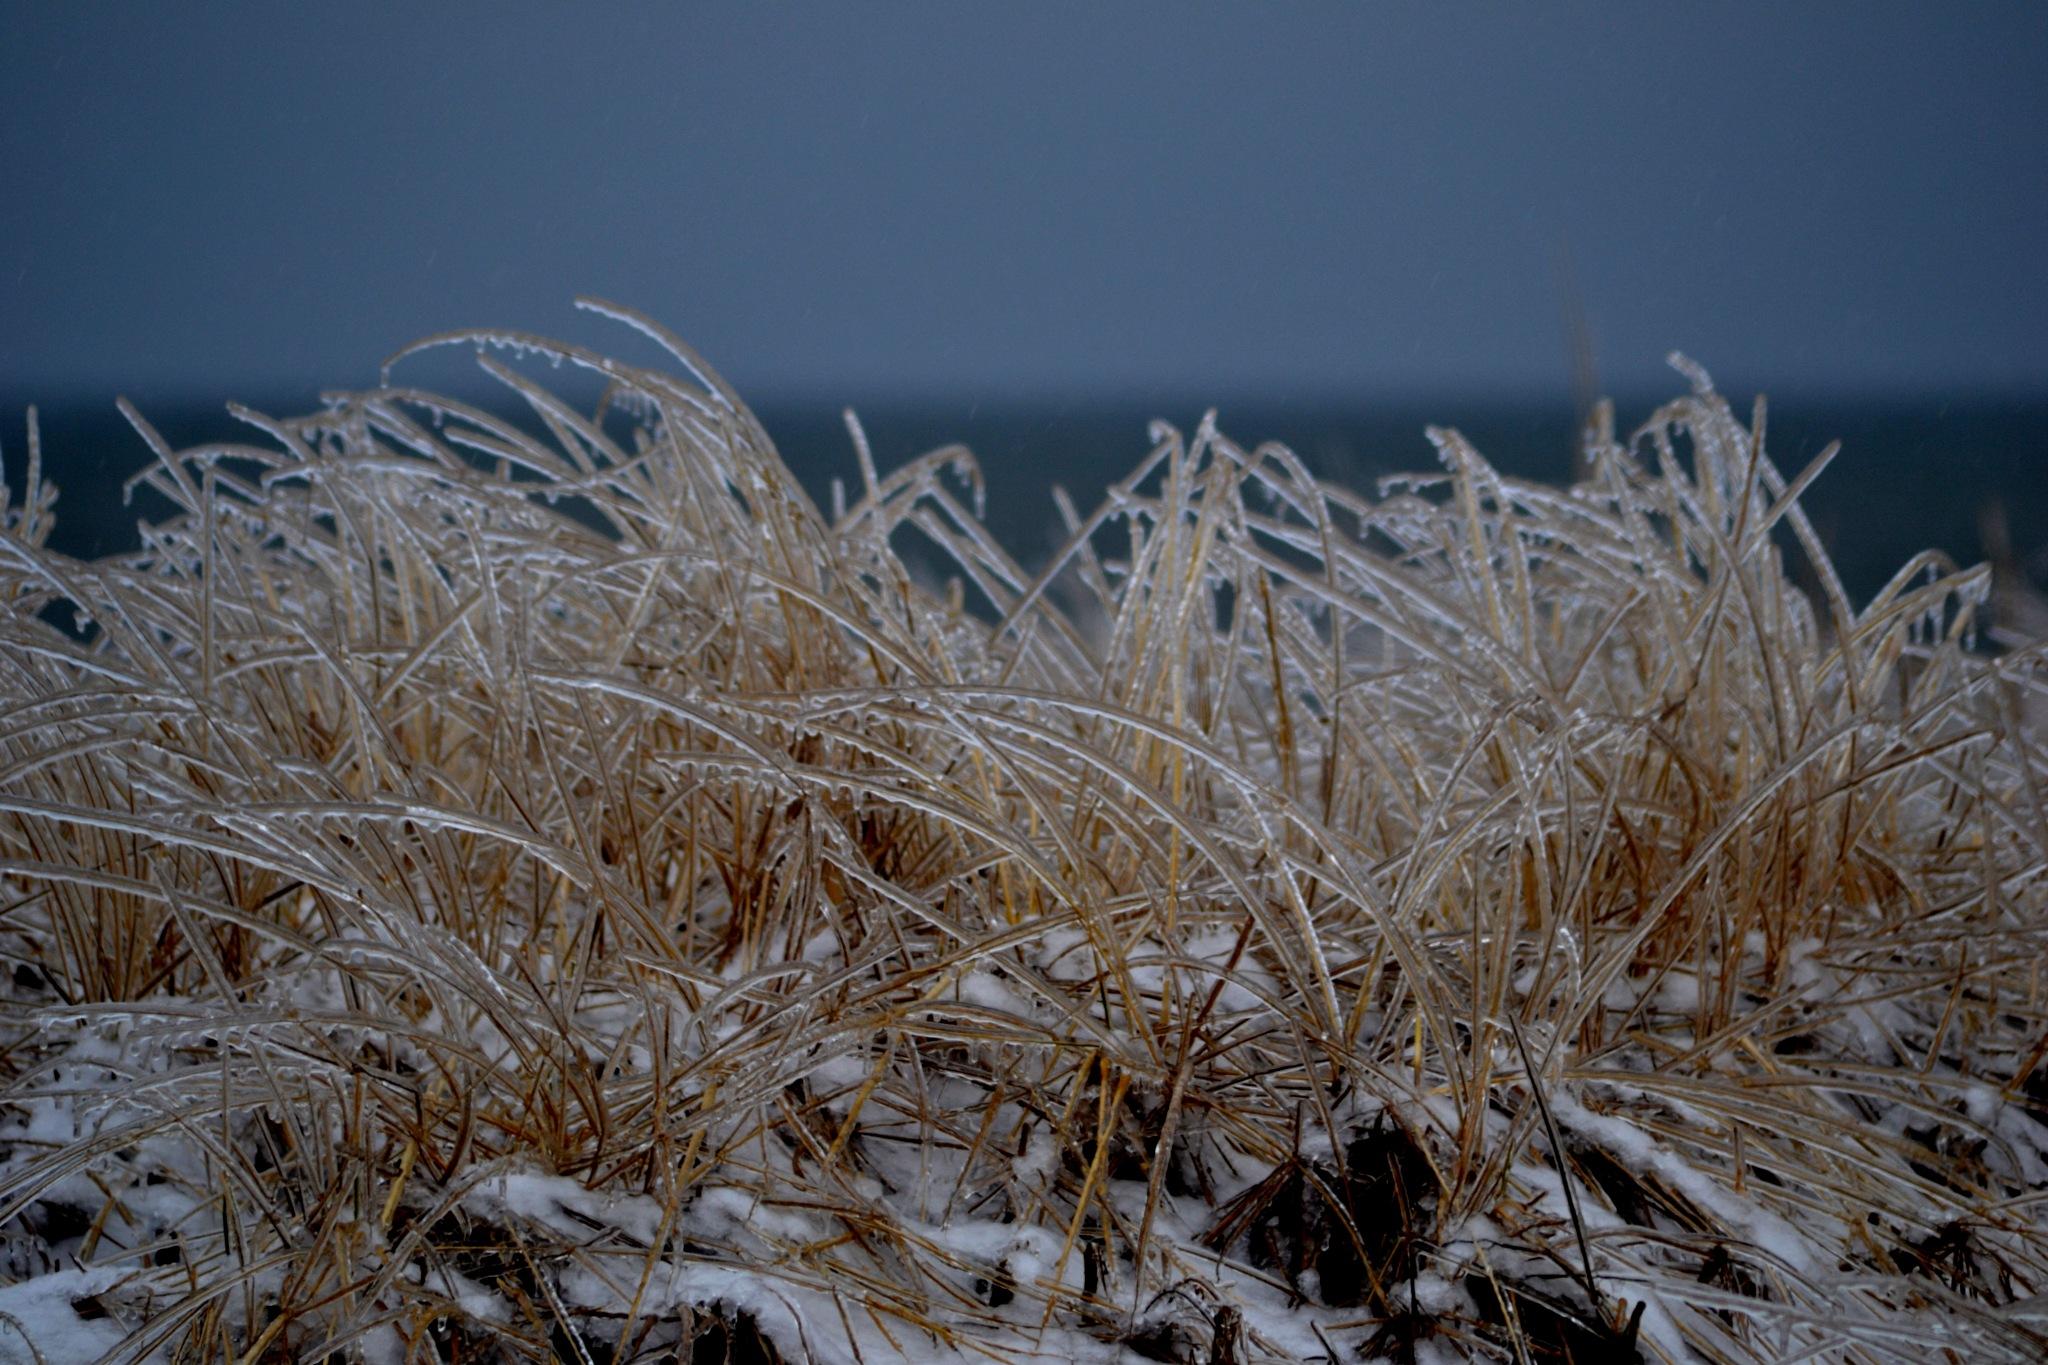 Iced by Steve Webb